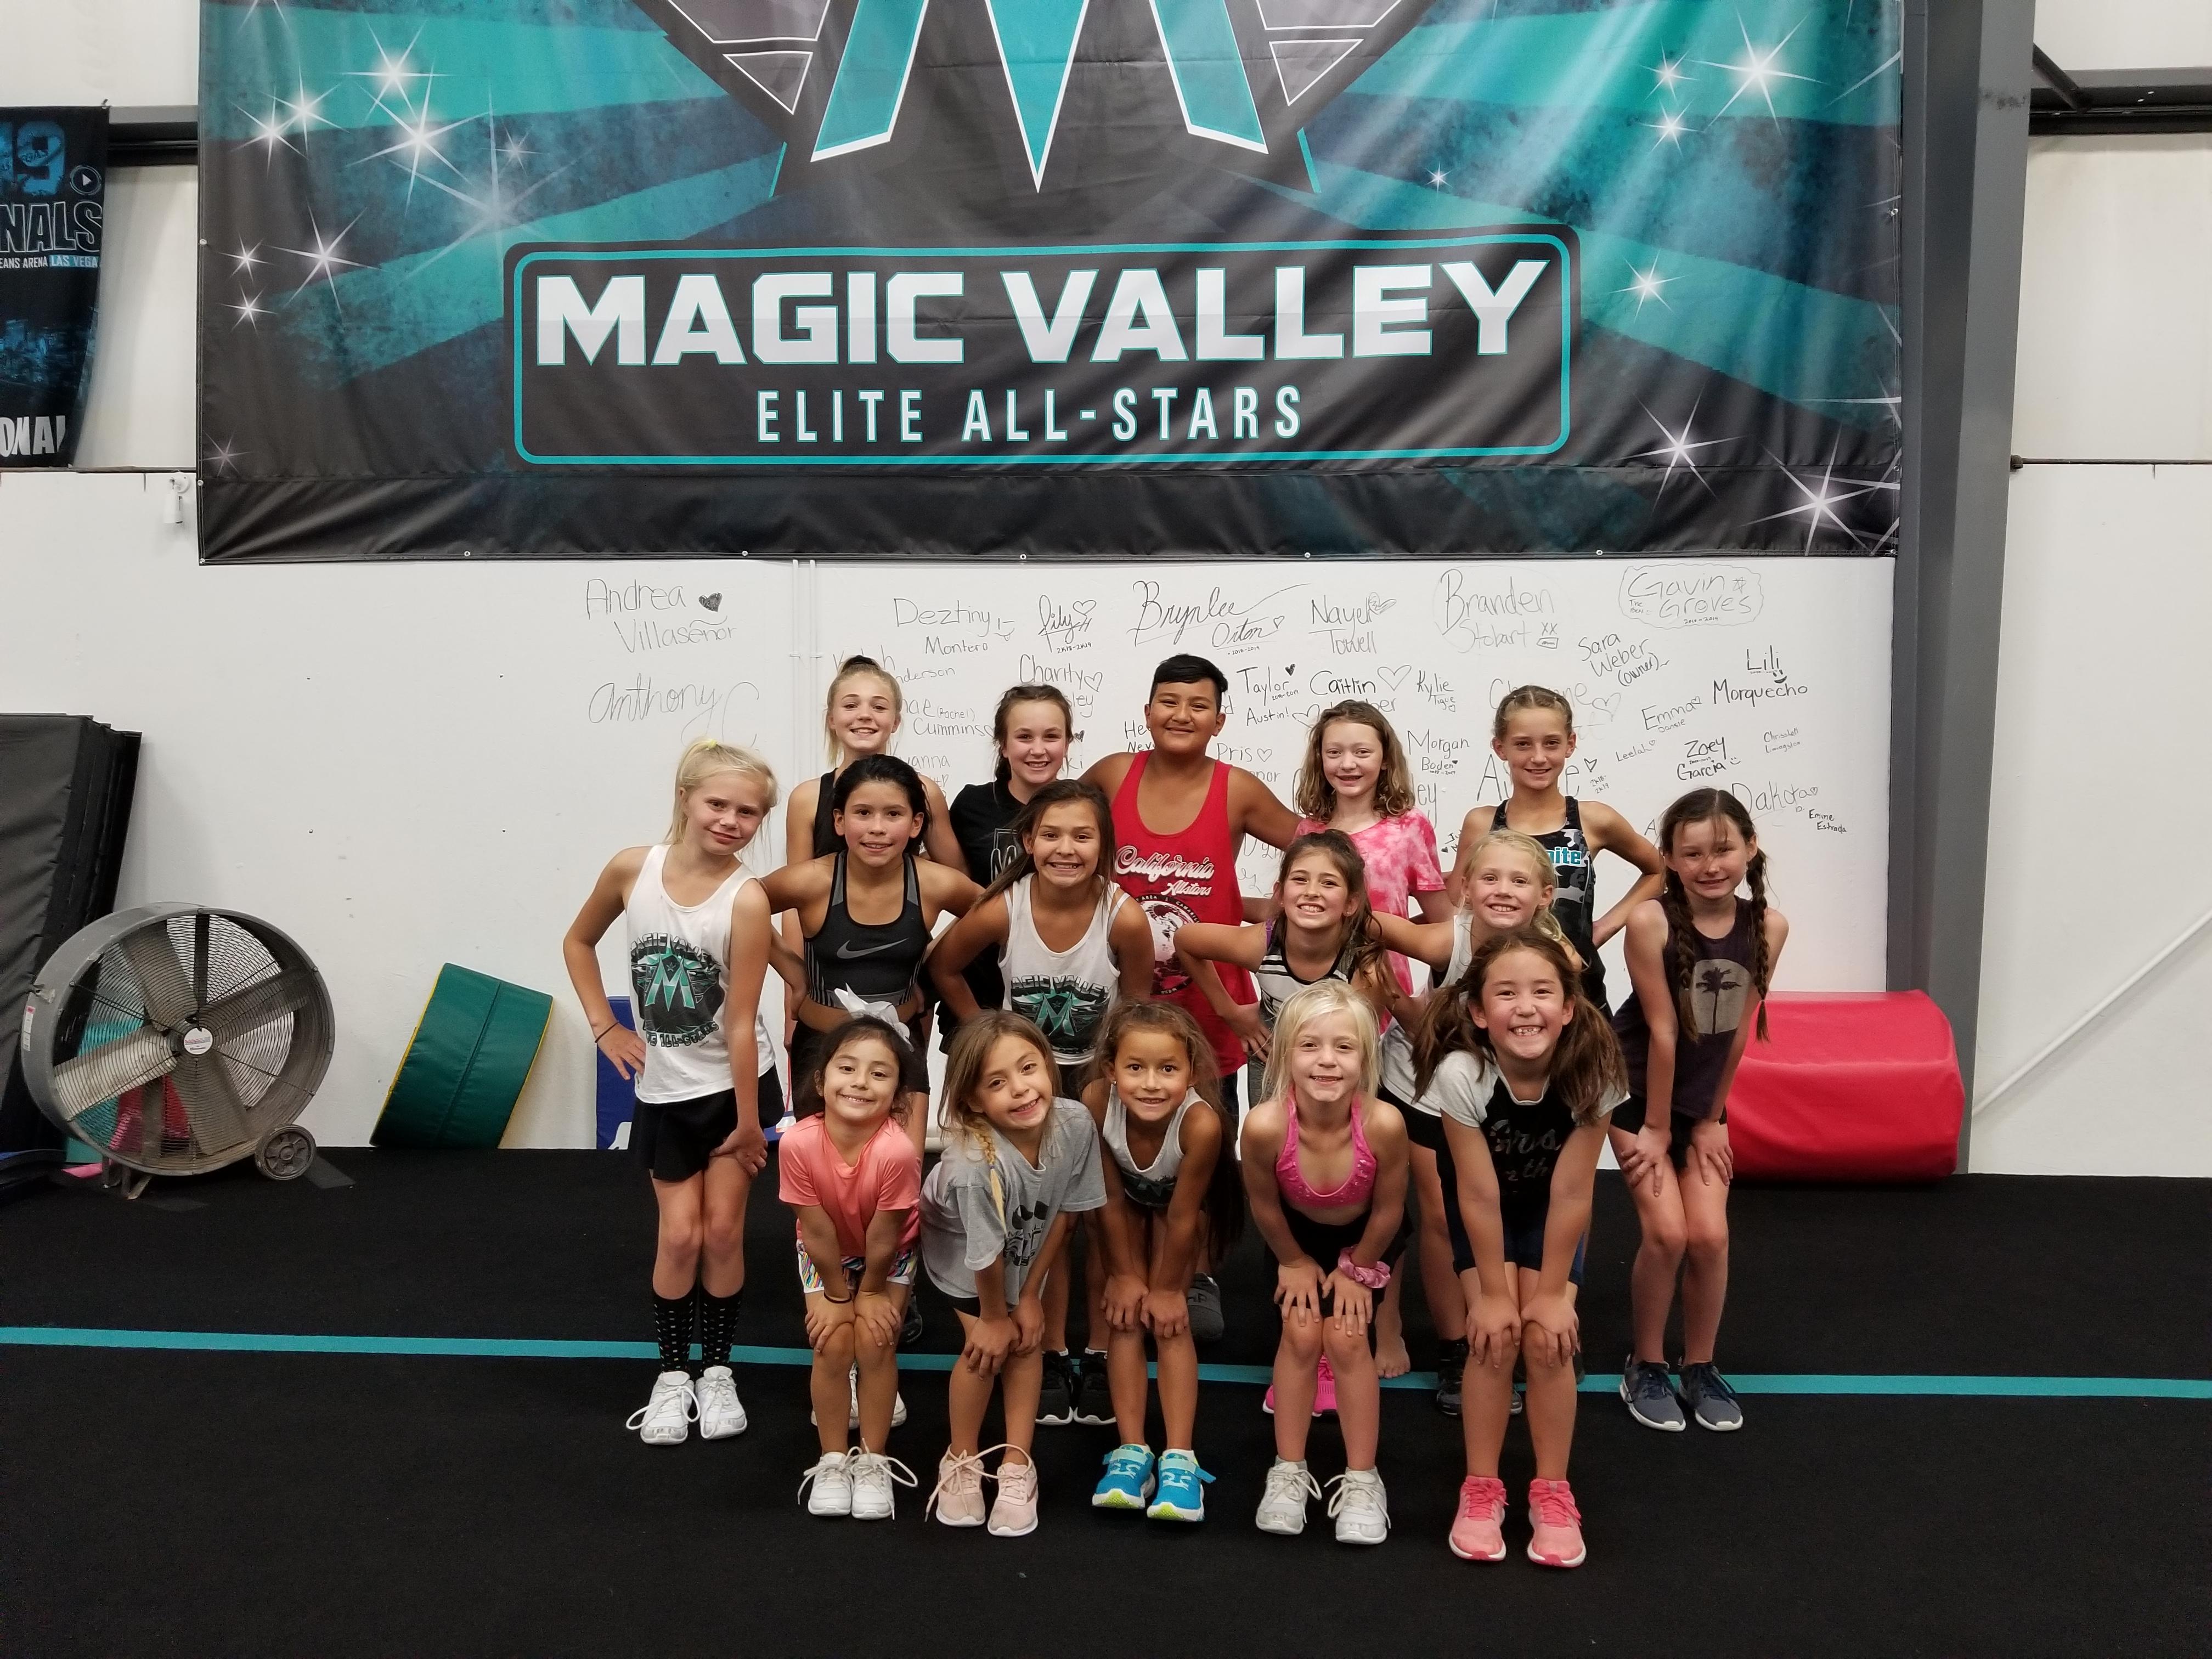 Magic Valley Elite